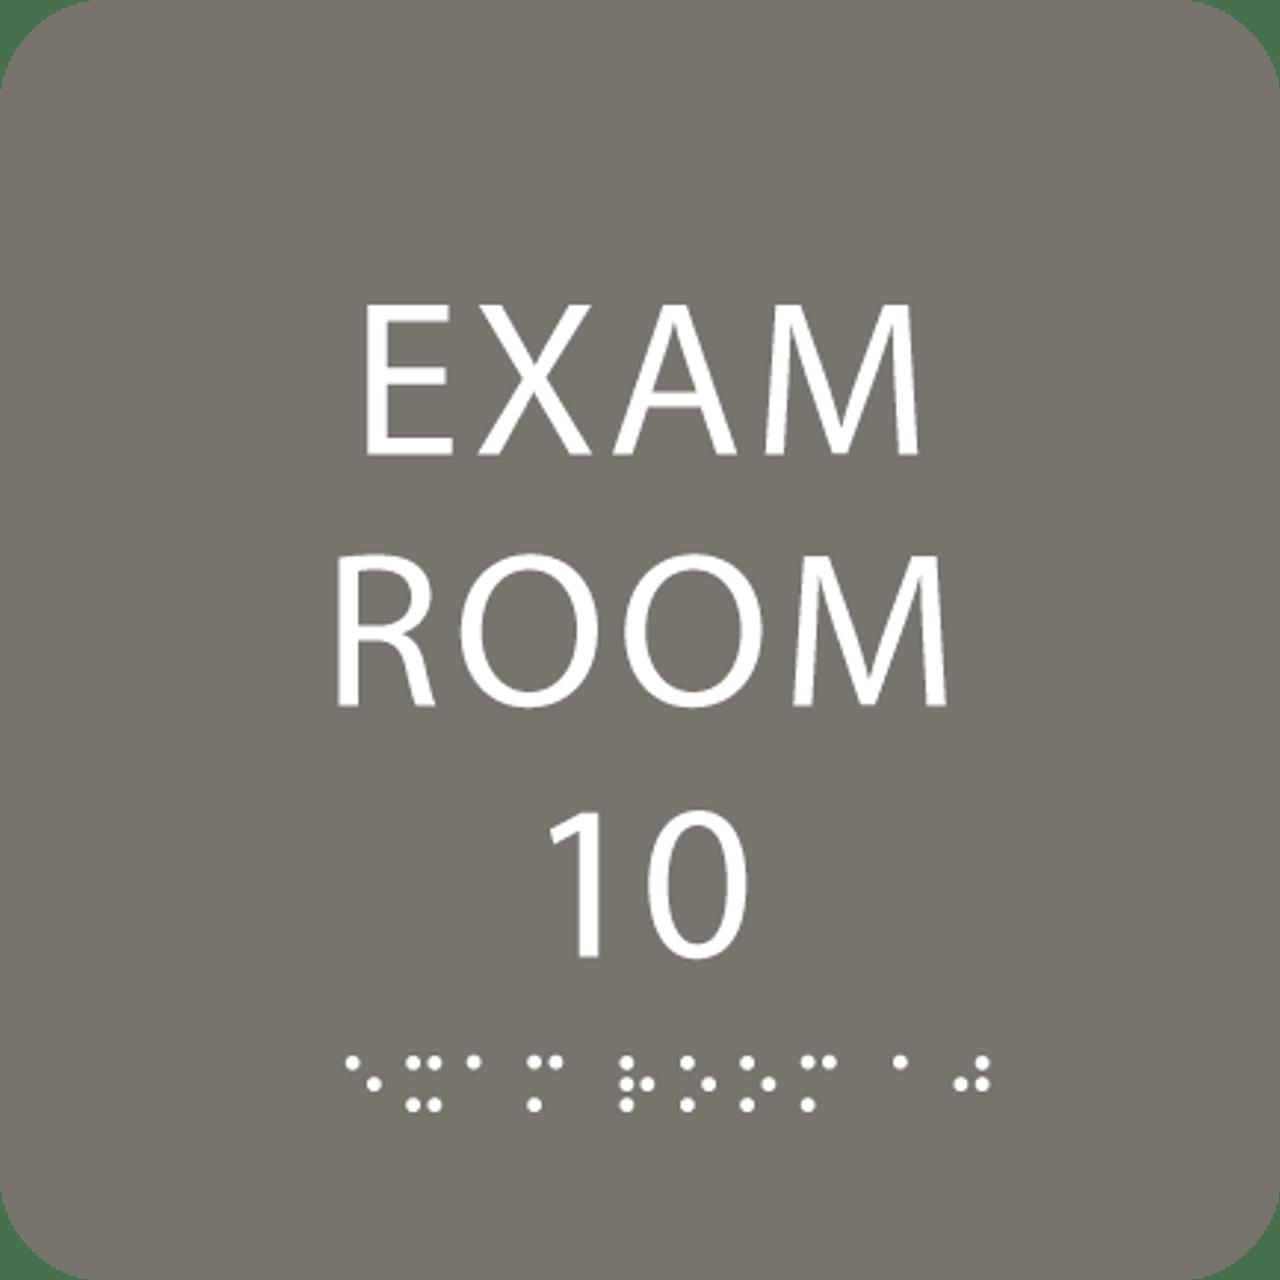 Dark Grey Exam Room 10 Sign w/ ADA Braille